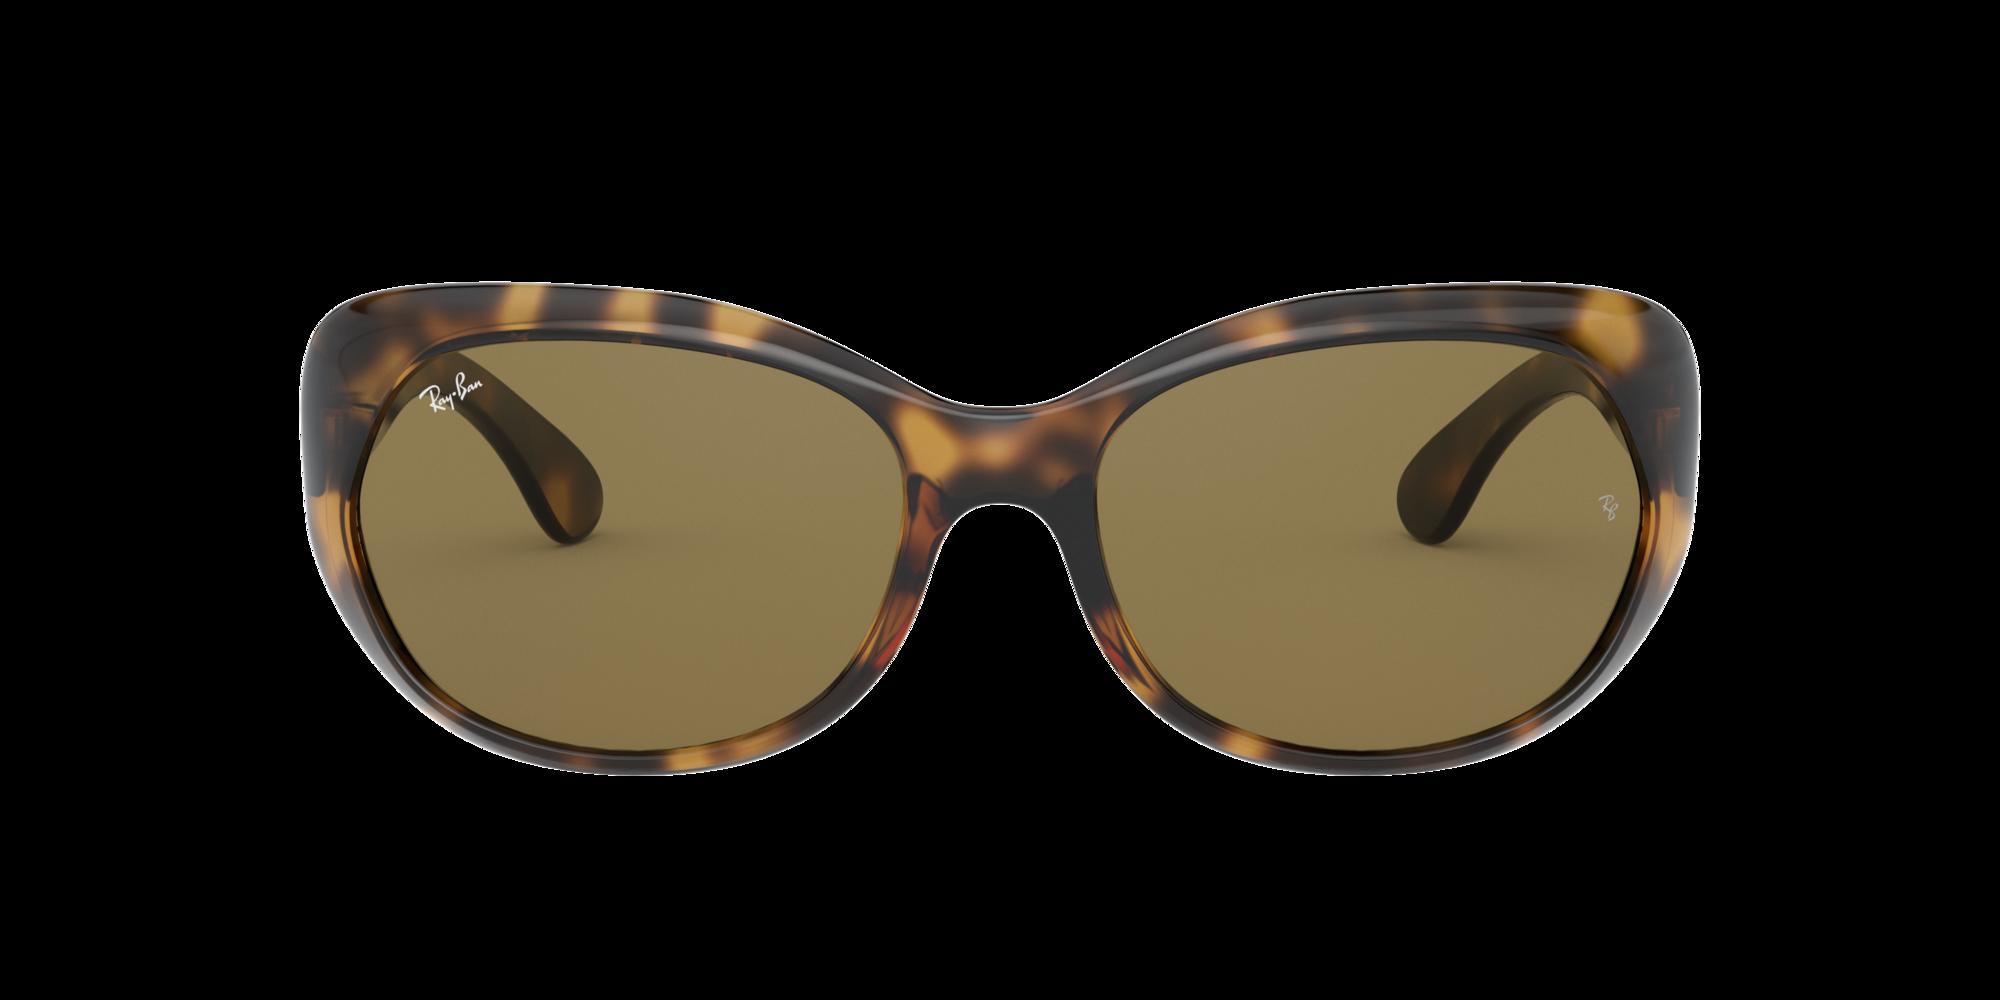 Image for RB4325 59 from LensCrafters | Glasses, Prescription Glasses Online, Eyewear